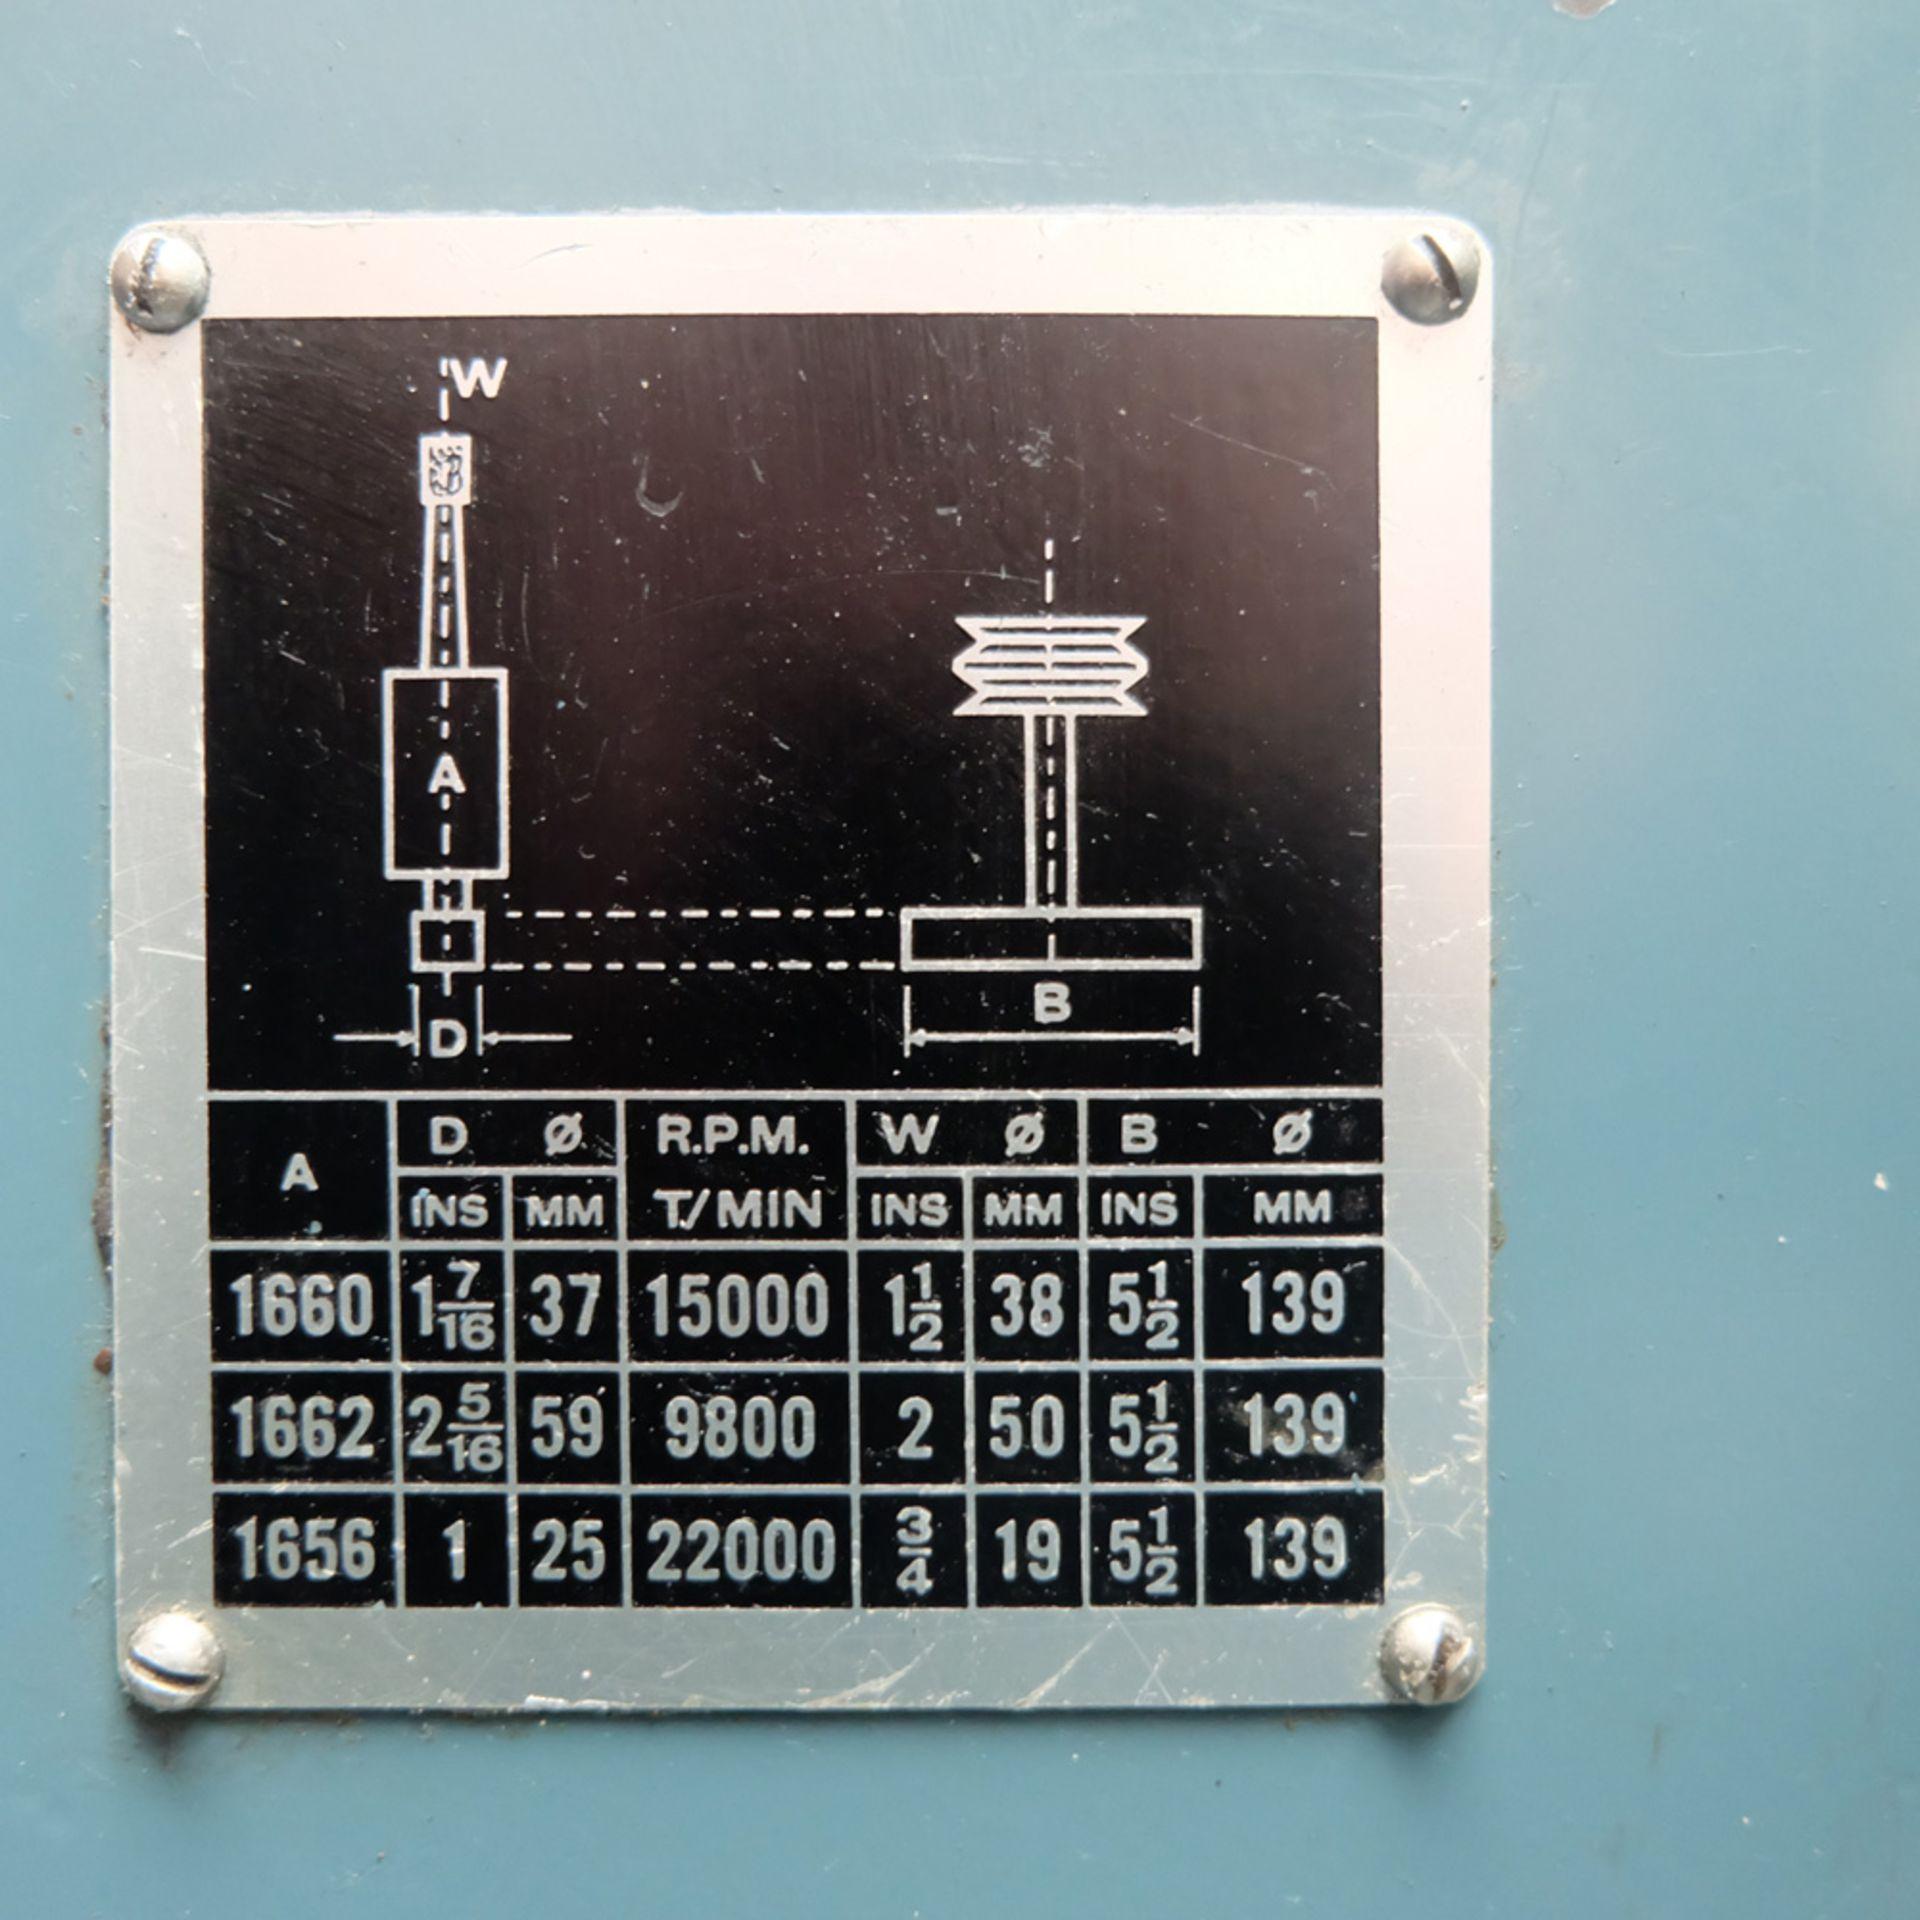 "Jones & Shipman Model 1311 EIU Universal Cylindrical Grinder. Capacity 18"" x 10"". - Image 8 of 12"